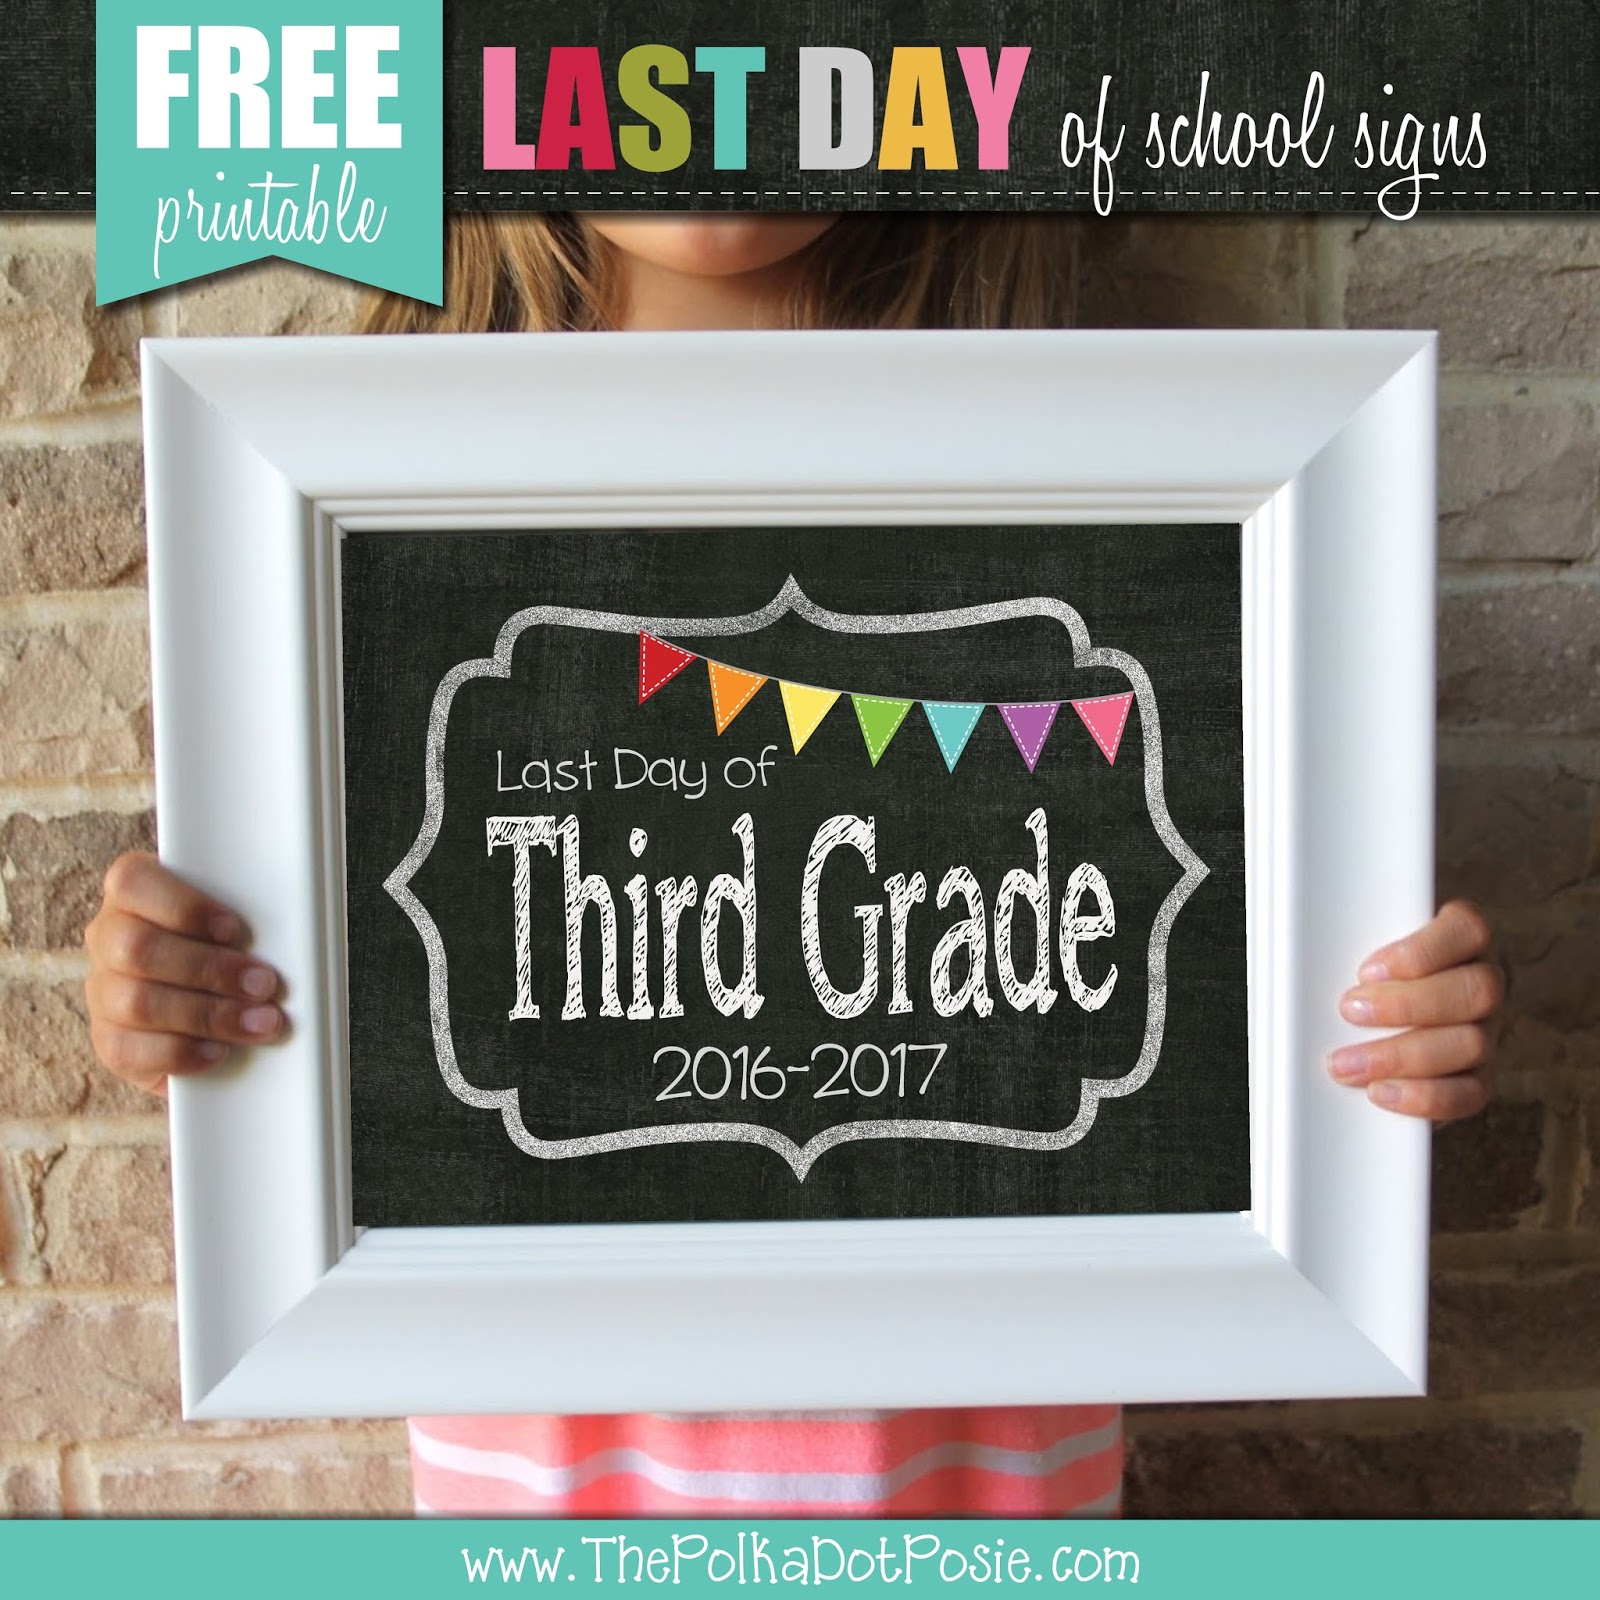 The Polka Dot Posie: Free Printable Last Day Of School Signs! - Free Printable First Day Of School Signs 2017